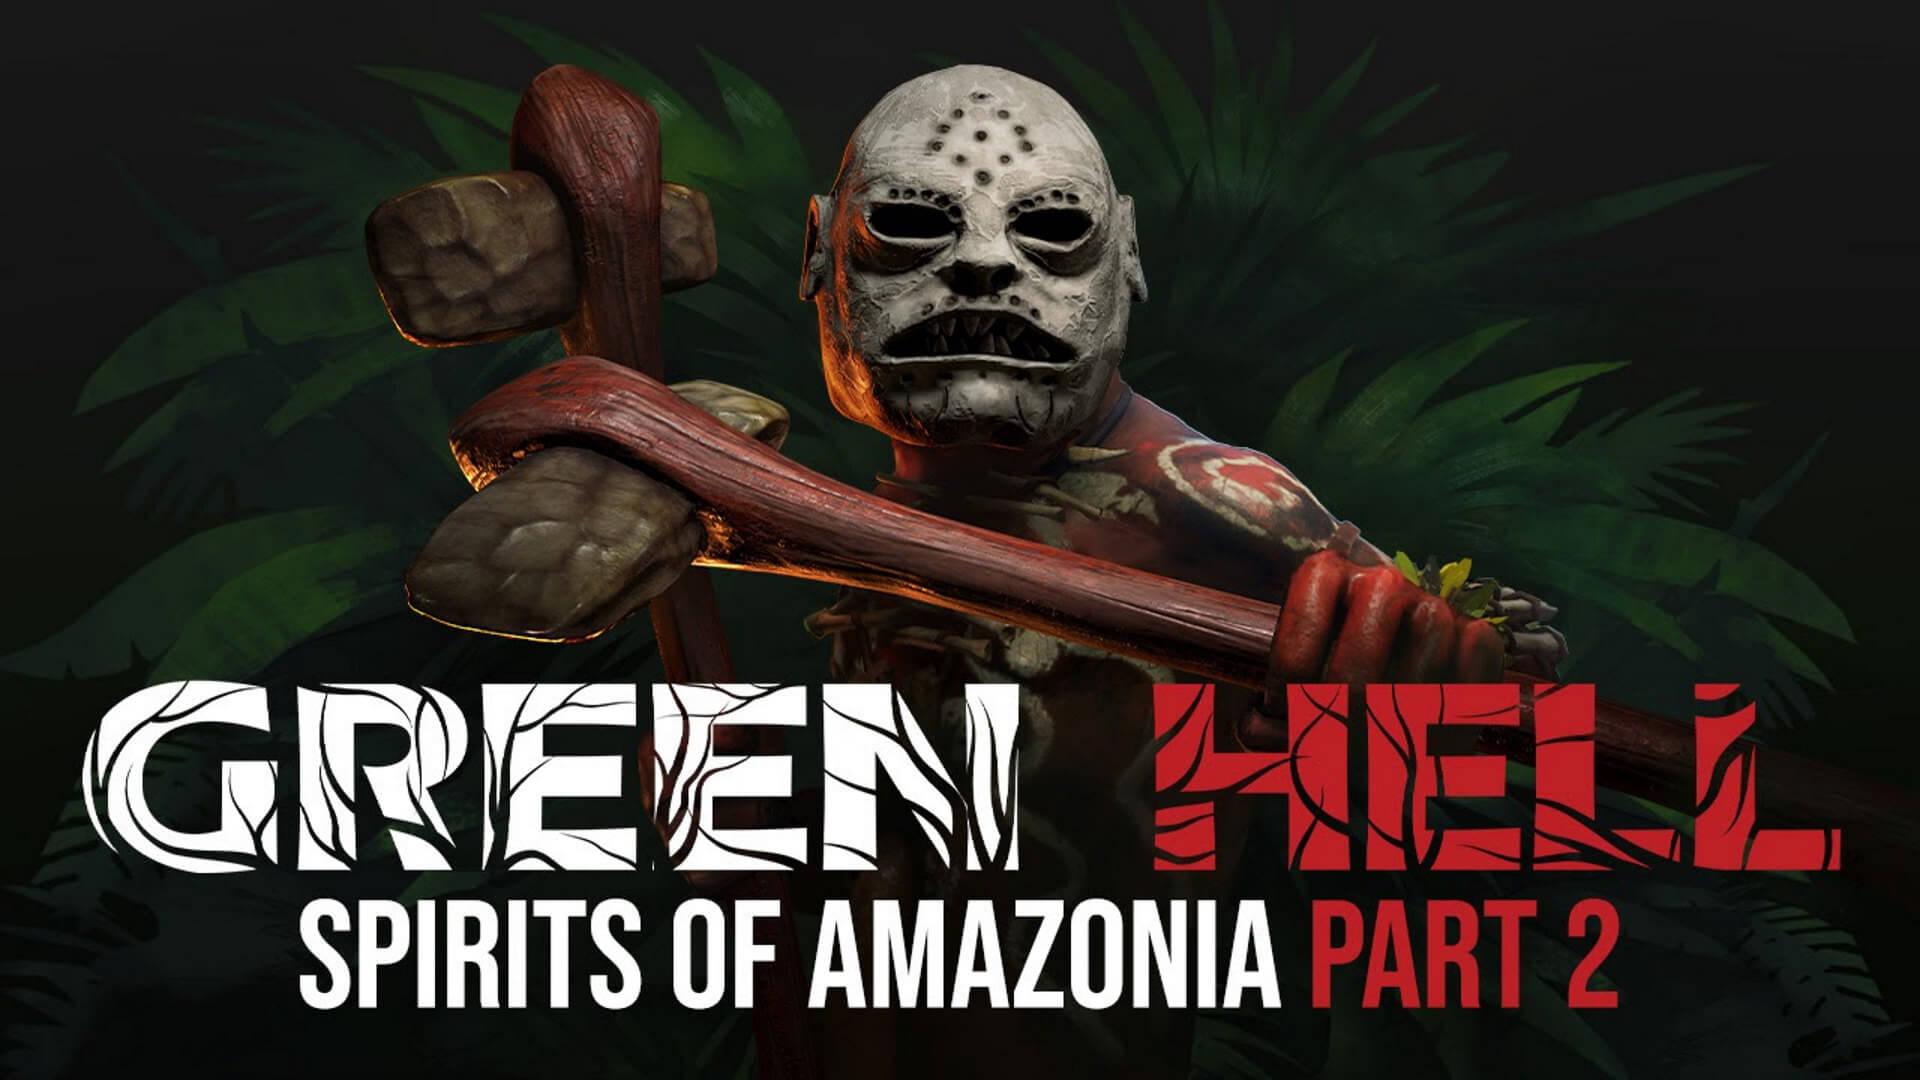 Green Hell Spirits of Amazonia Part 2 Key Art